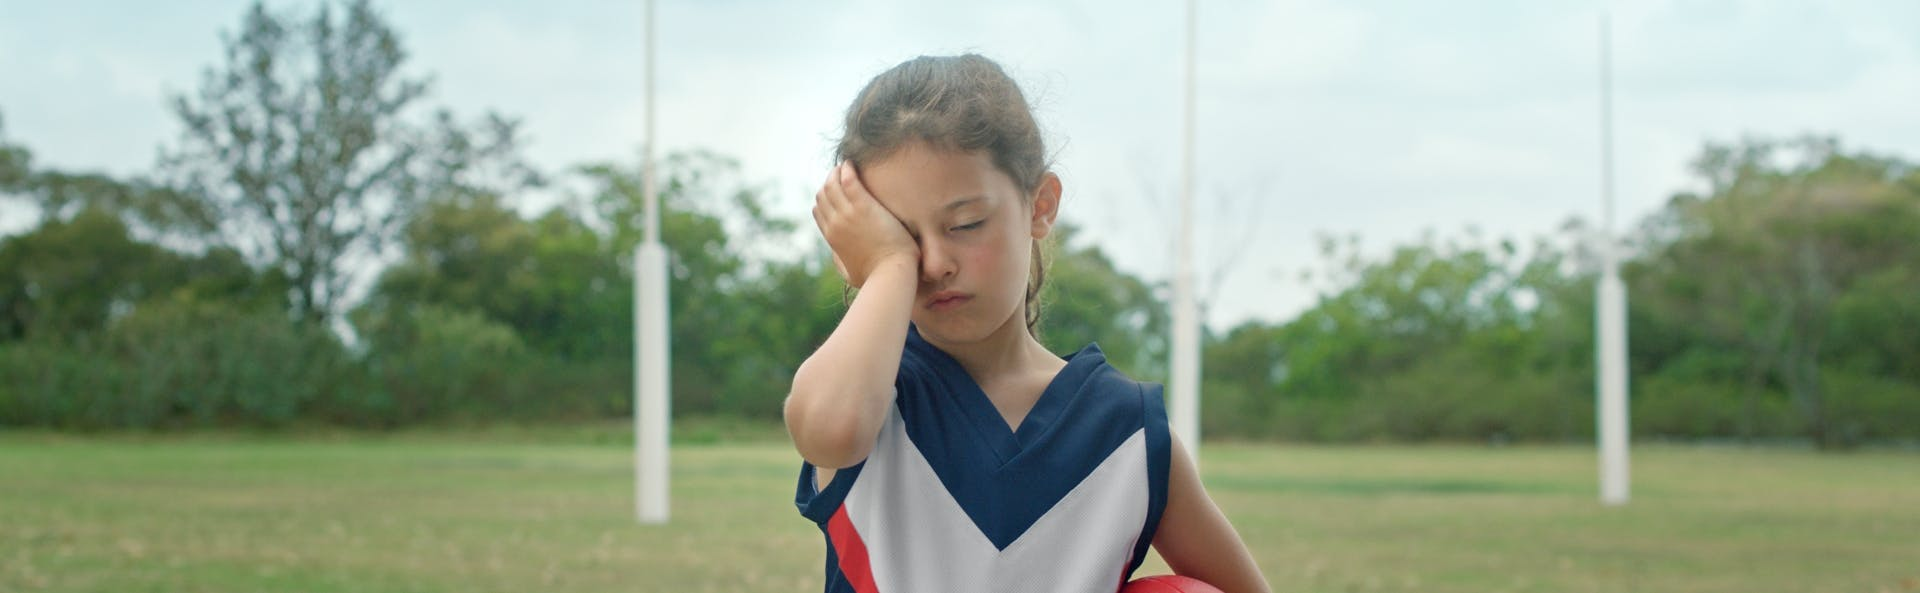 Kid in sports clothes rubbing their eye